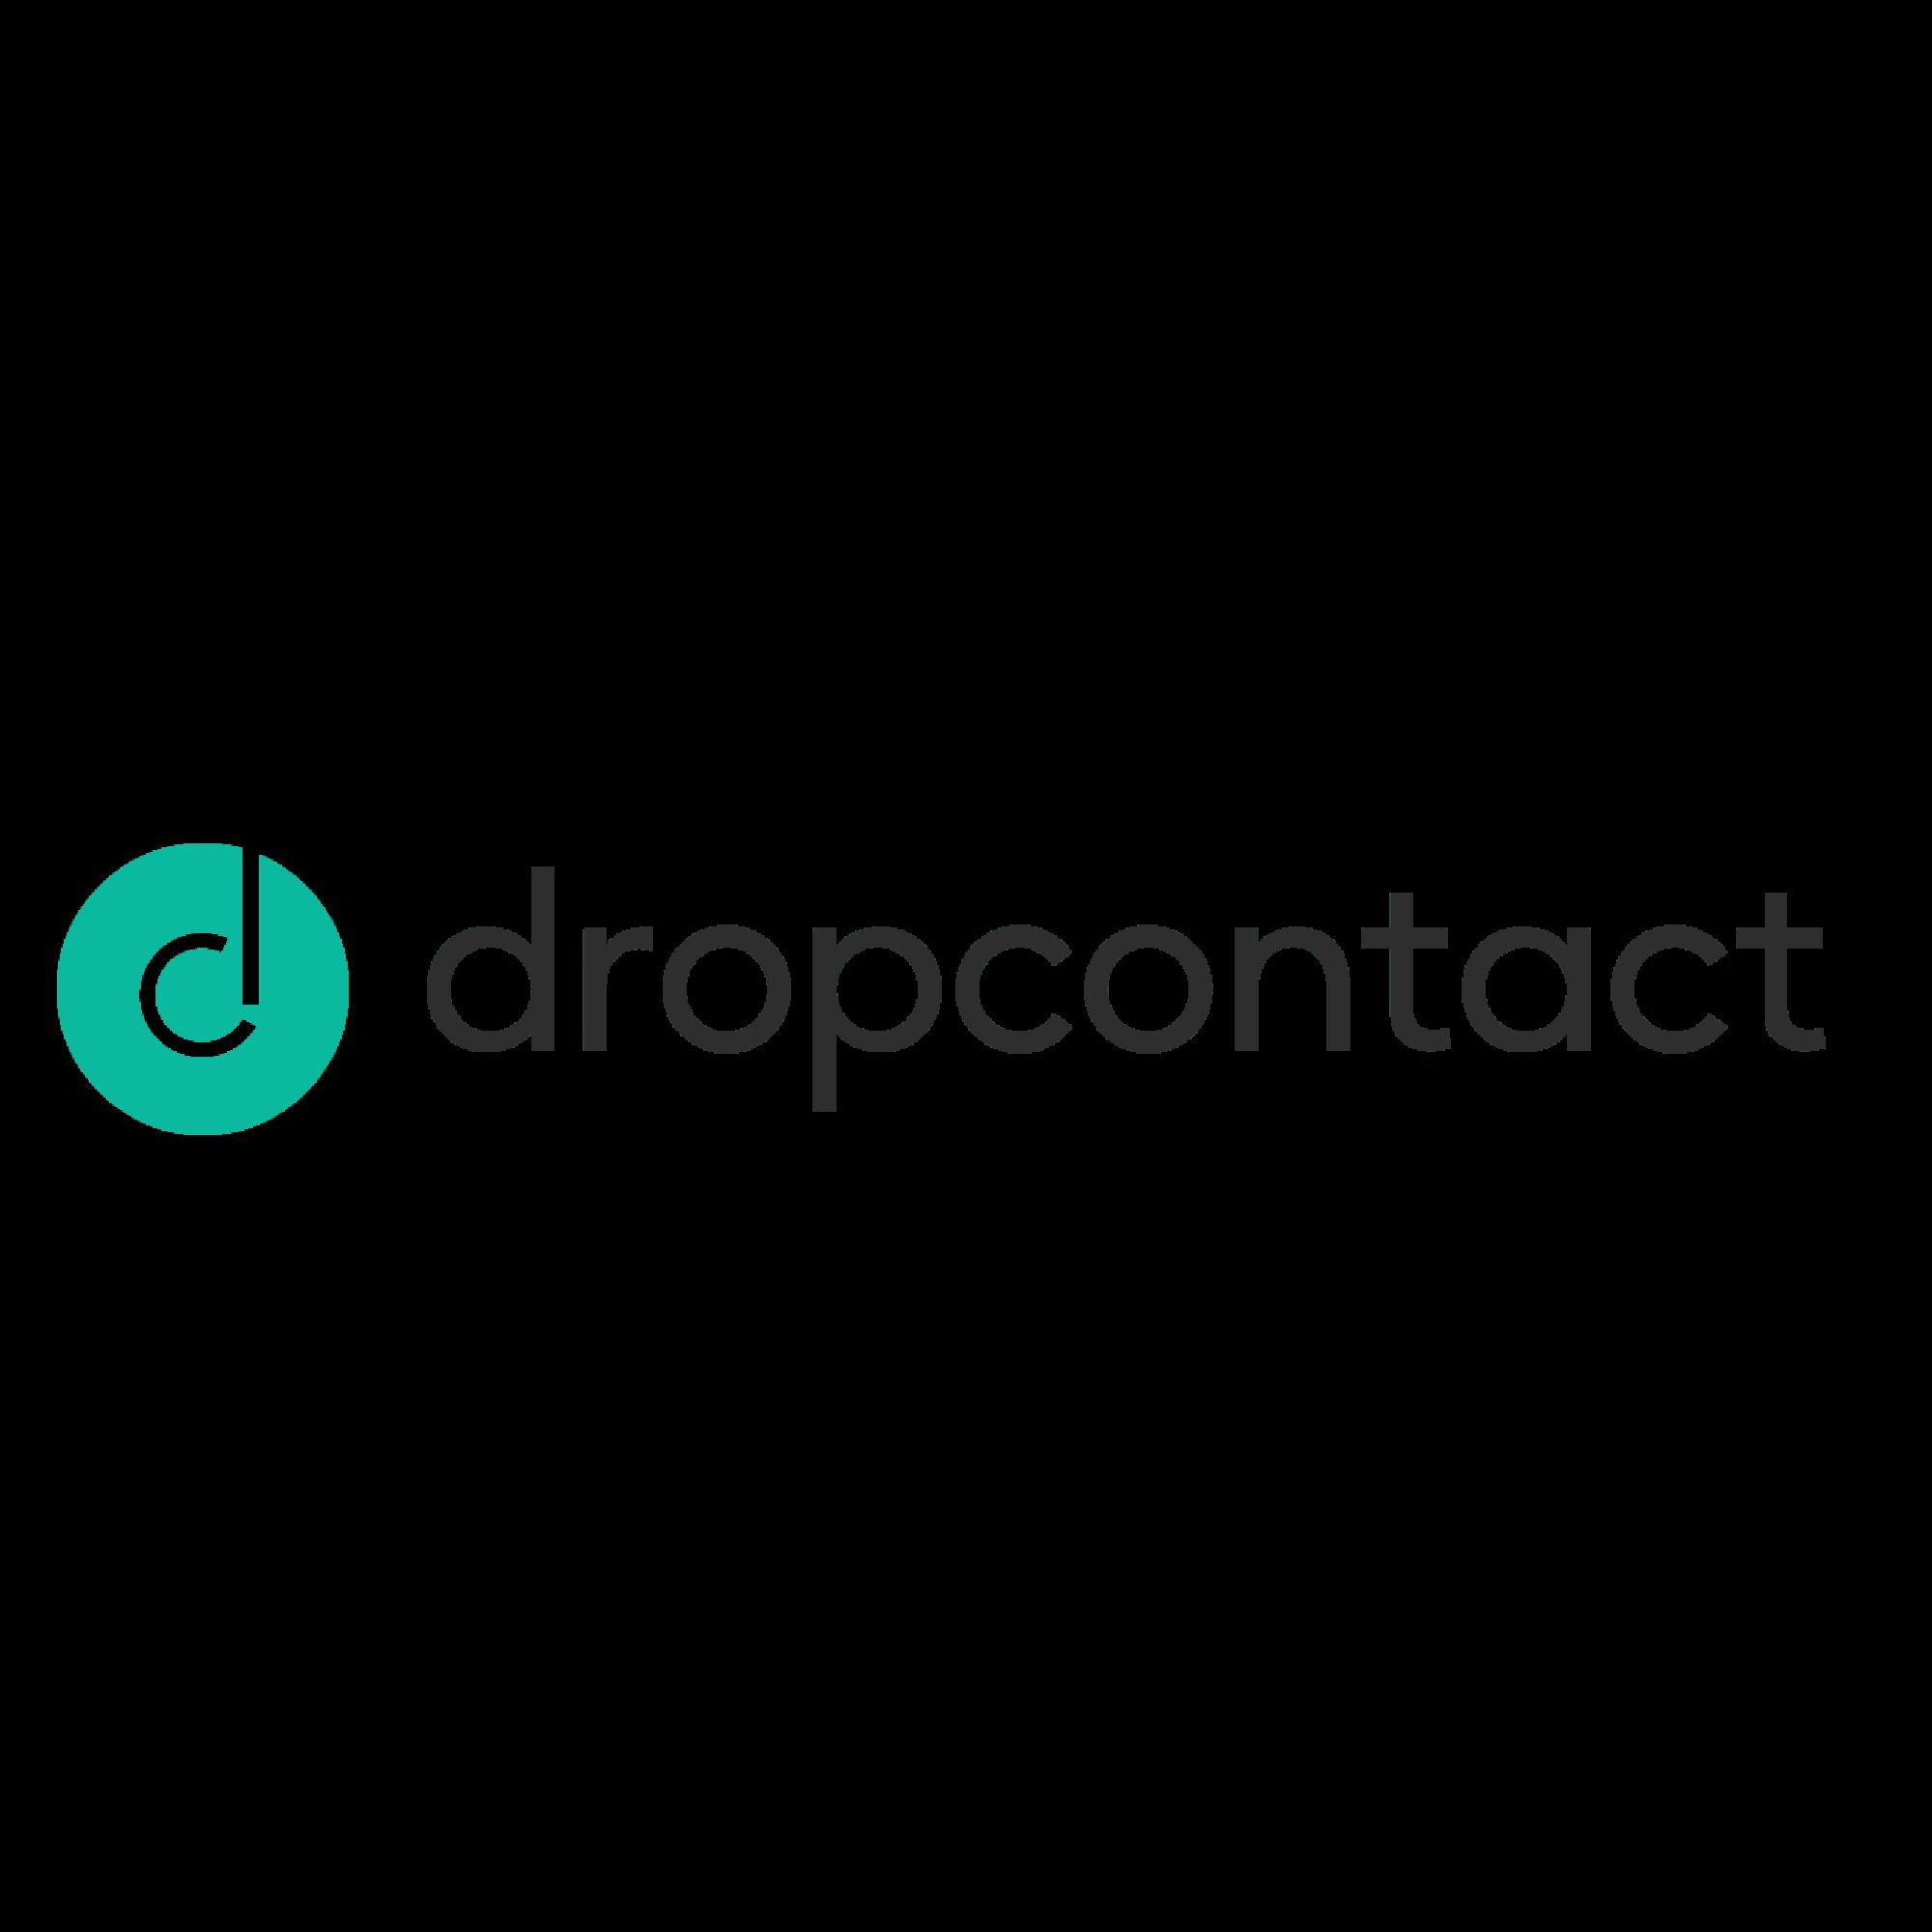 dropcontact-logo